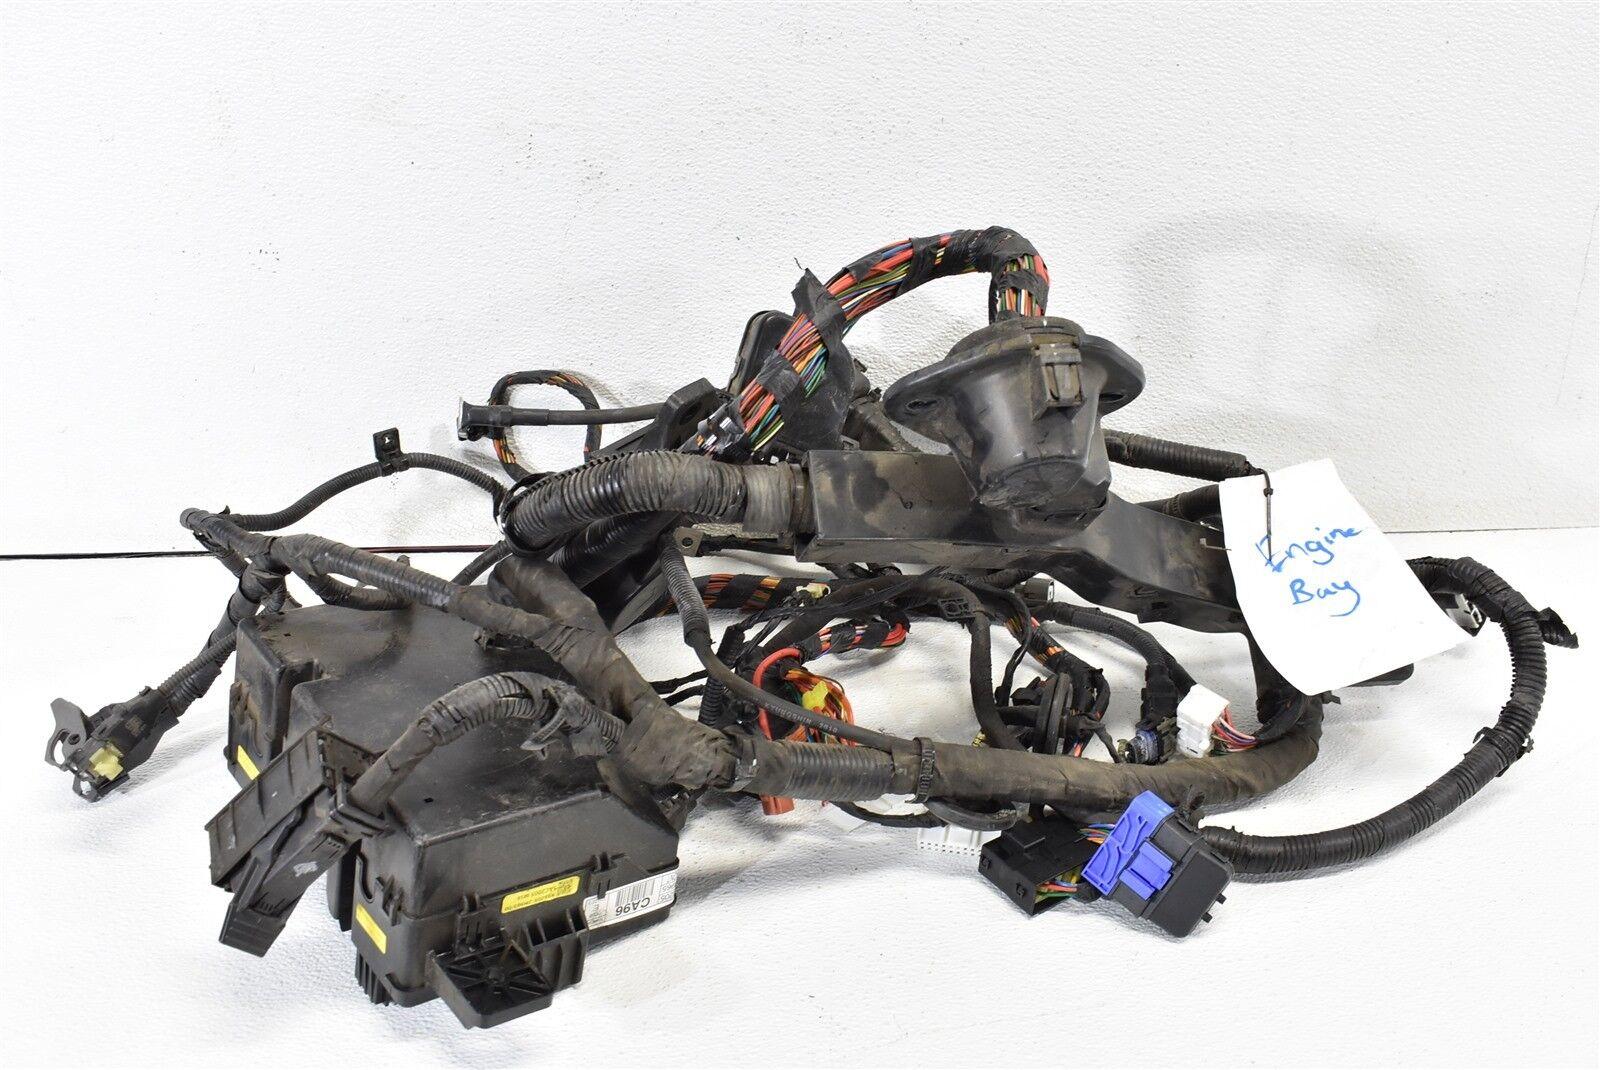 wiring harness hyundai genesis 2011 hyundai genesis coupe 3 8 engine bay wiring harness oem 91205  2011 hyundai genesis coupe 3 8 engine